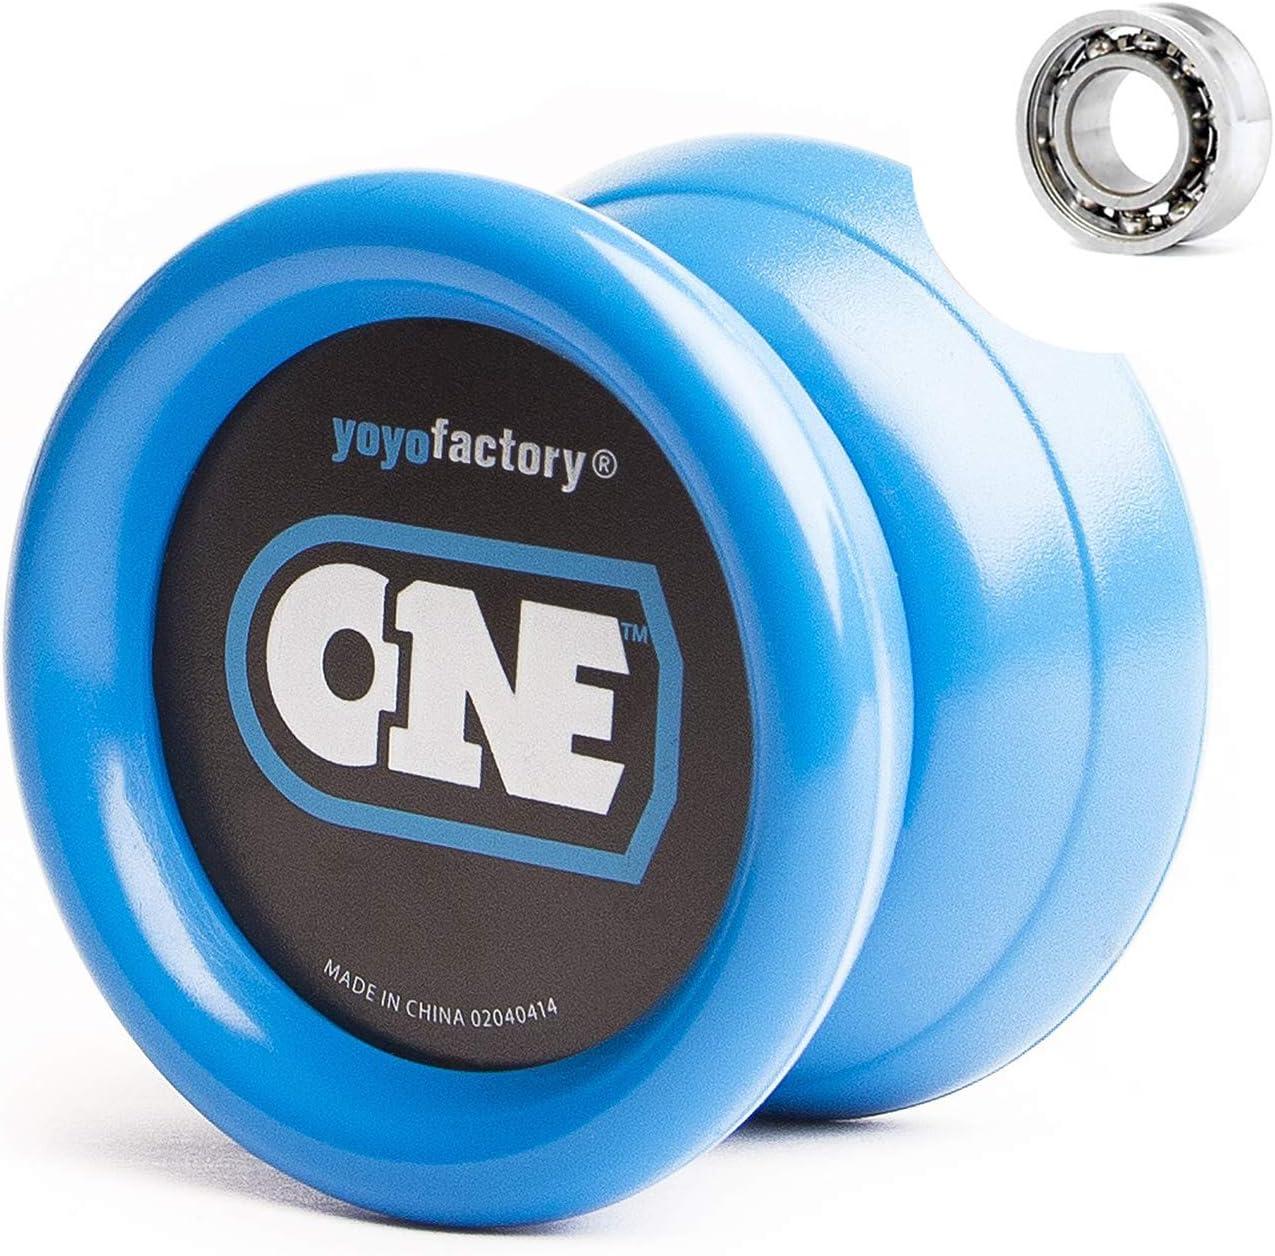 YoyoFactory ONE Yo-Yo - Black Gifts Spinning Directly managed store yoyo to Beginner Modern